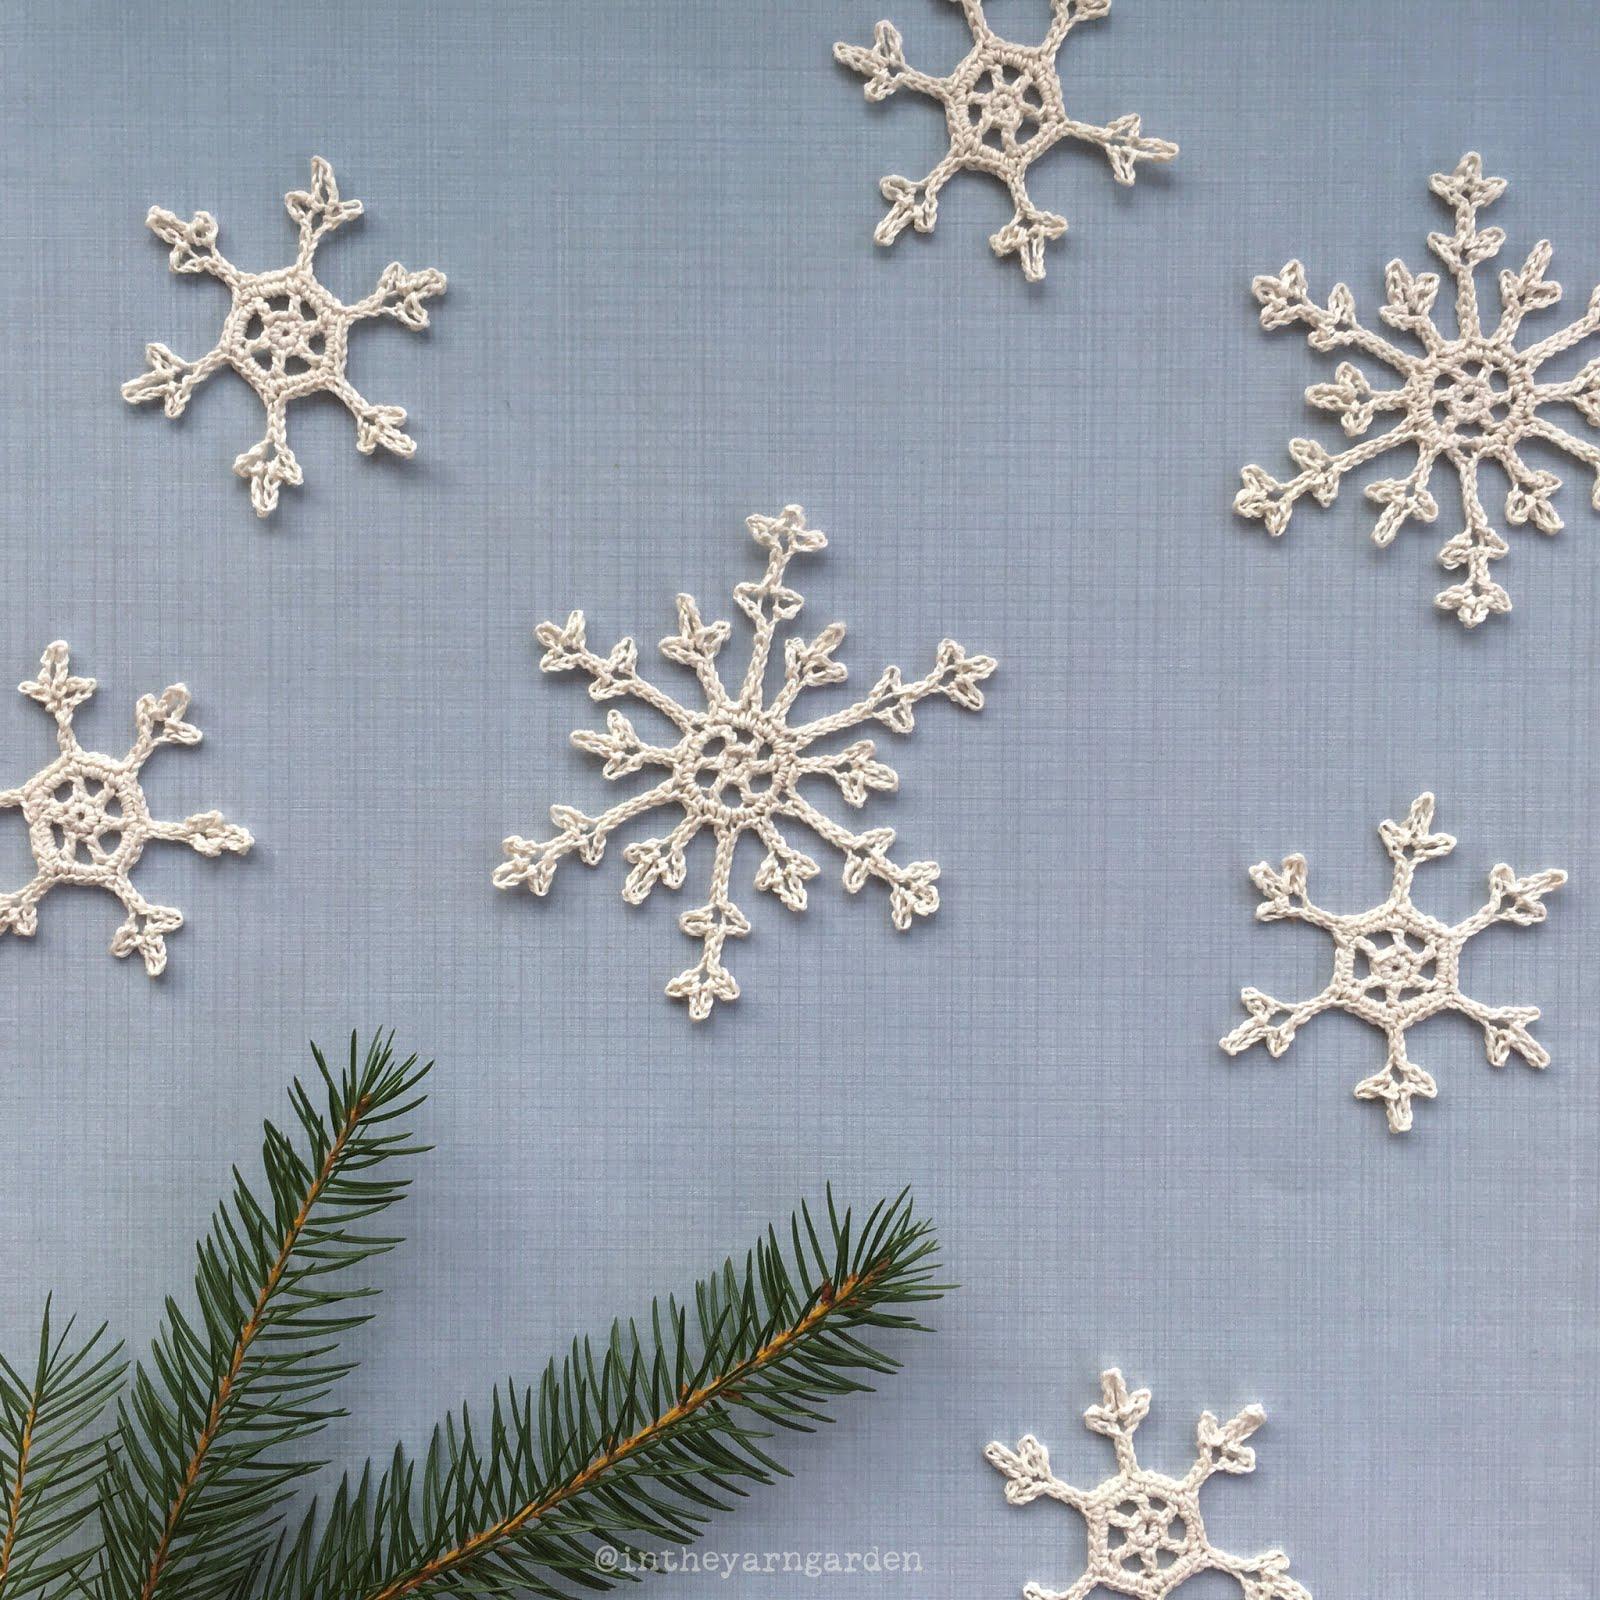 Crochet Snowflake : Crochet snowflakes